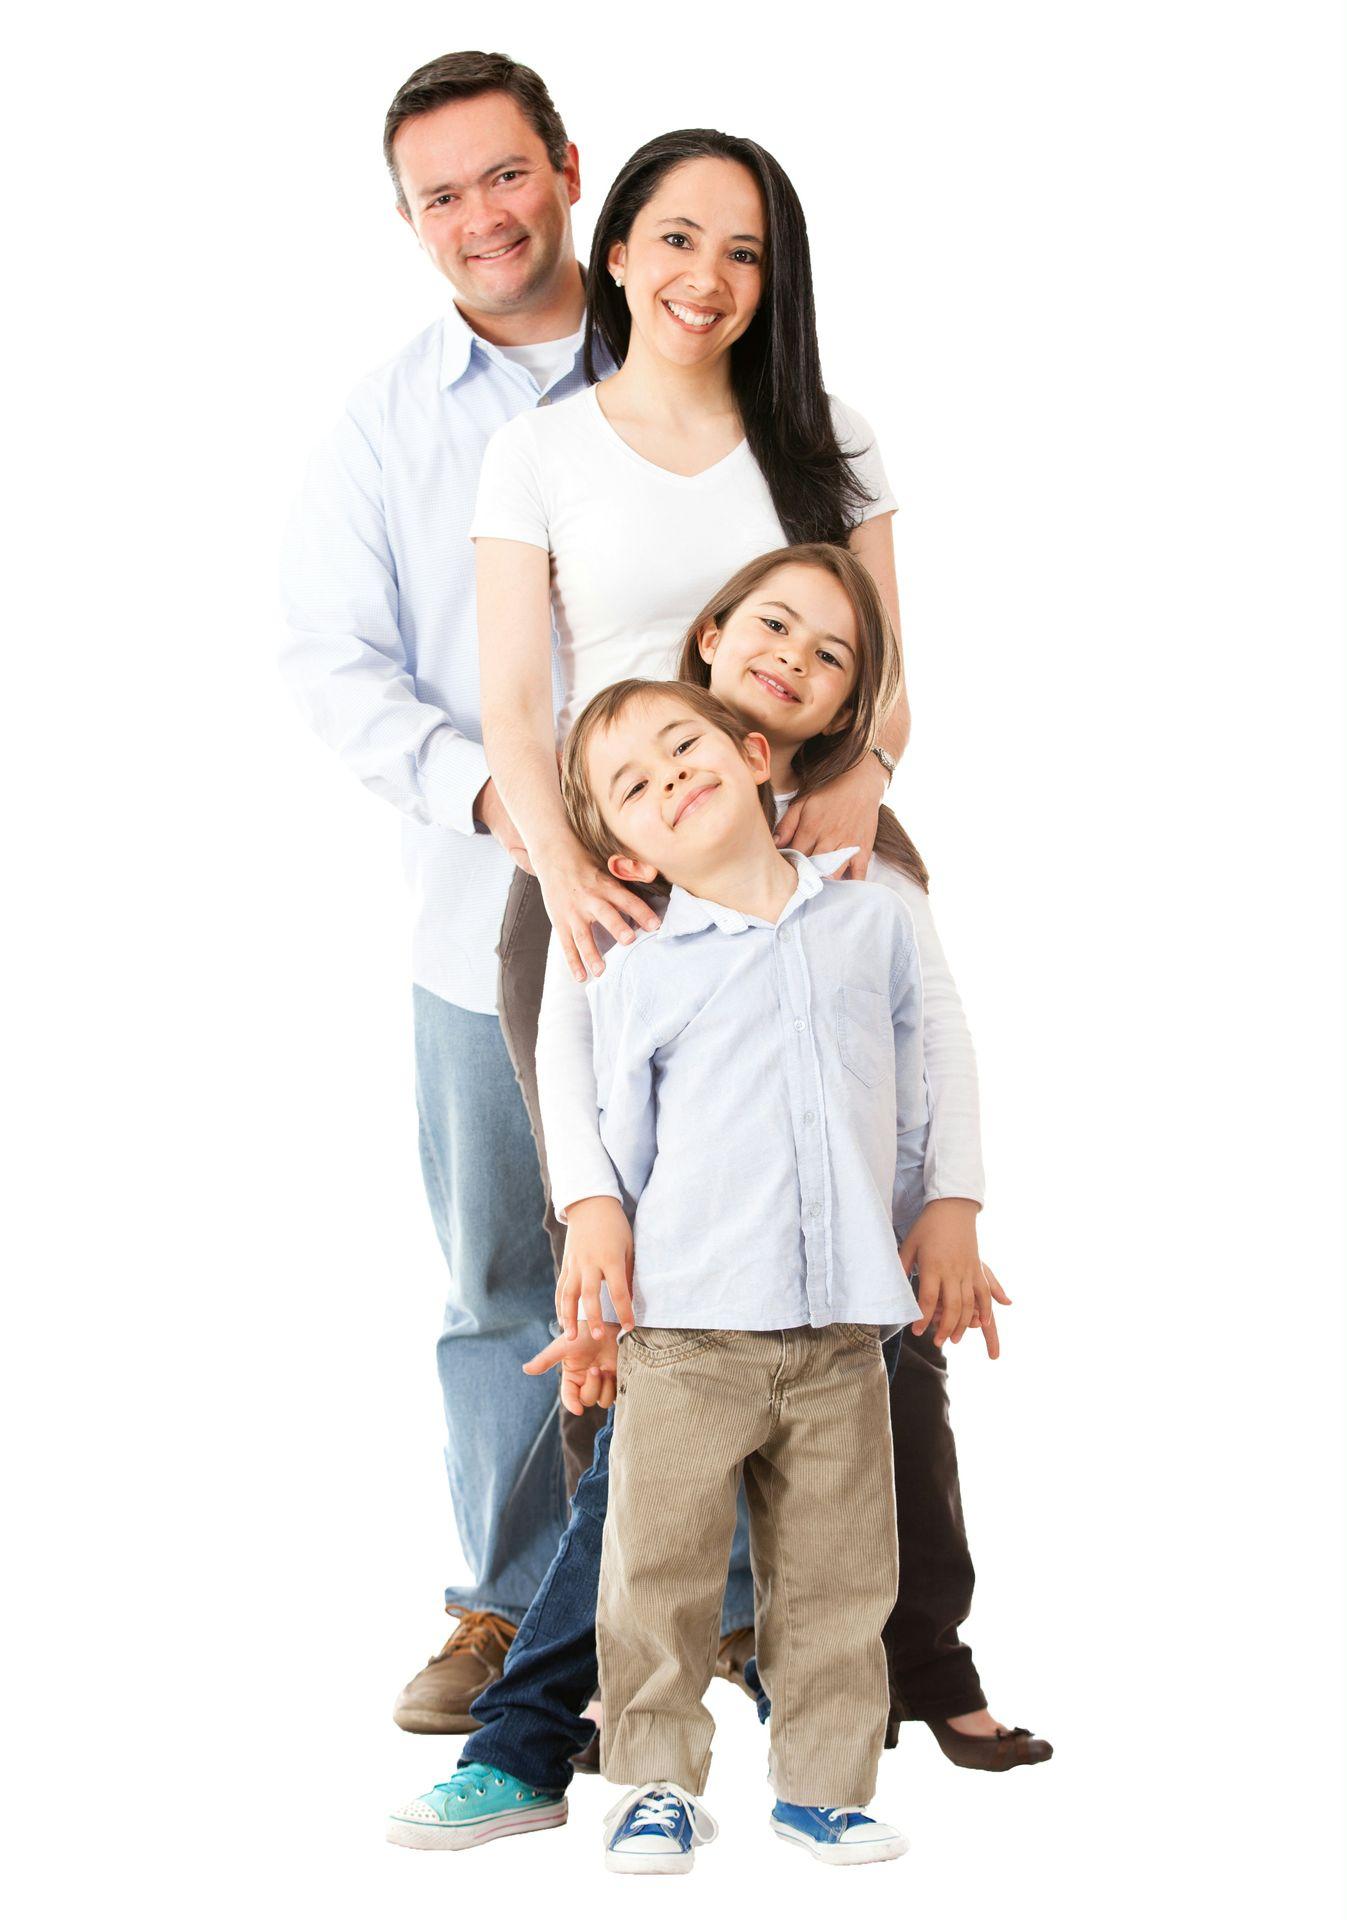 happy-family-png-5-happy-family